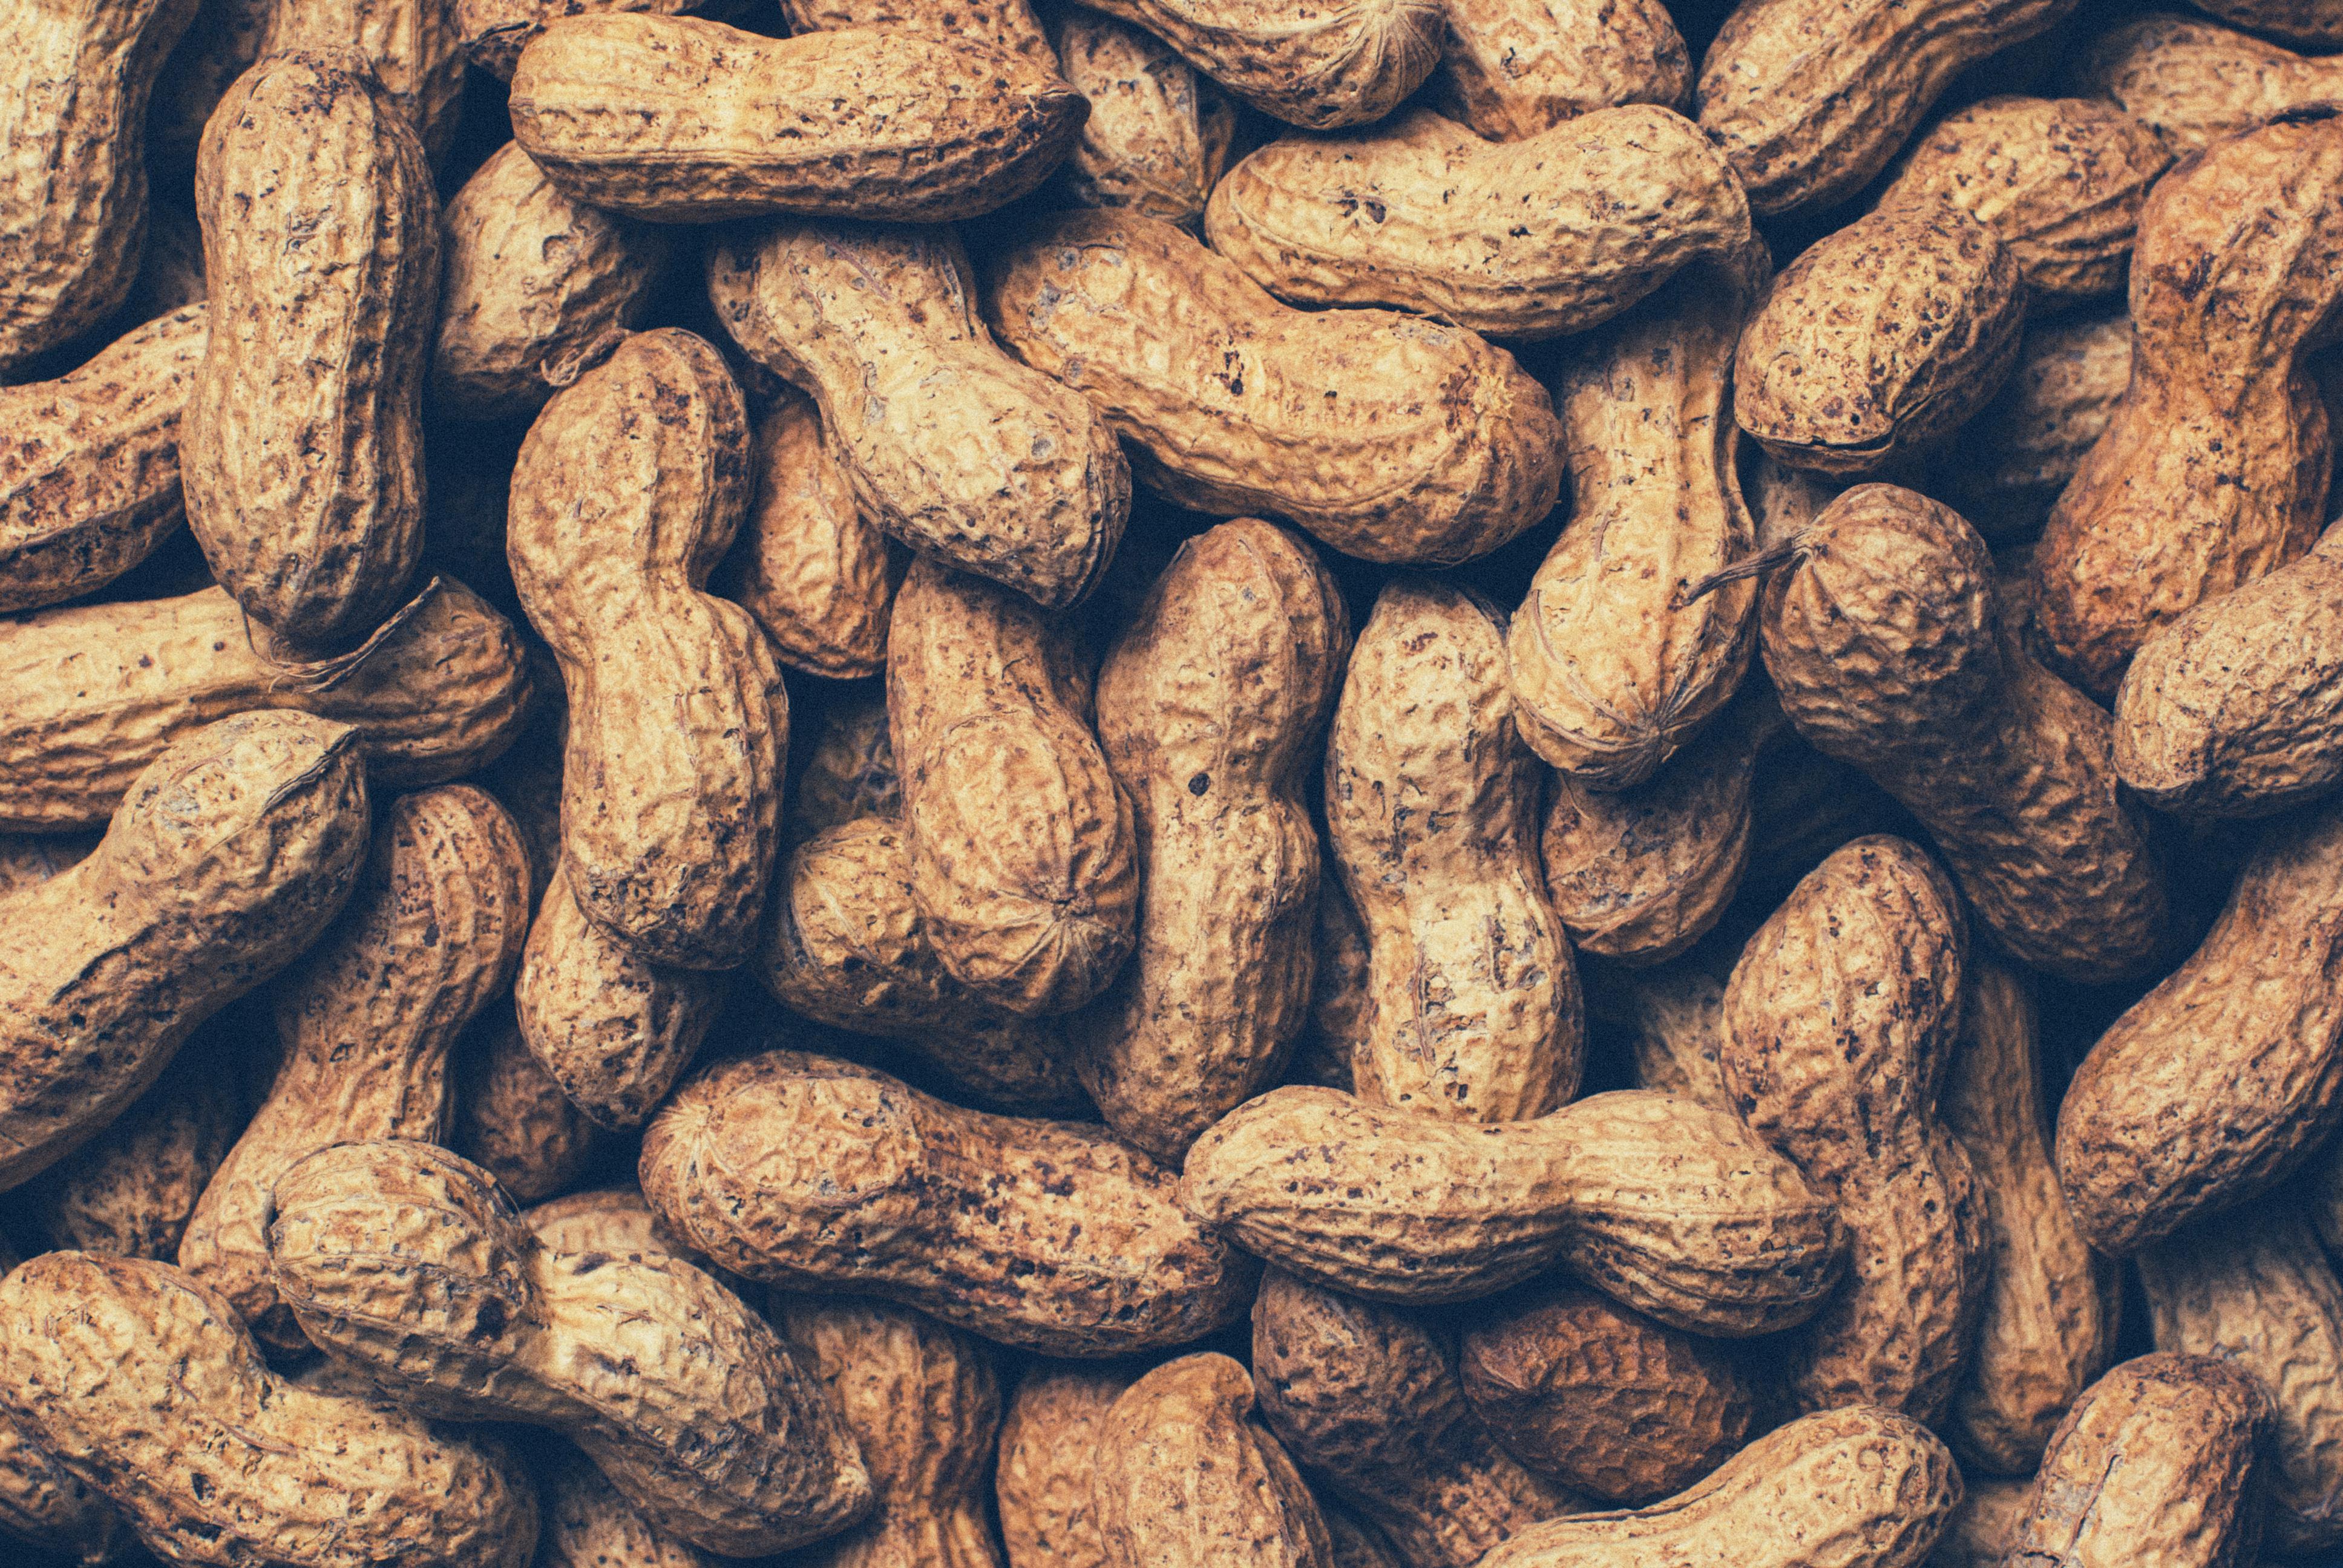 Iphone Lock Screen Wallpaper Hd Selective Focus Photograph Of Plate Of Peanuts 183 Free